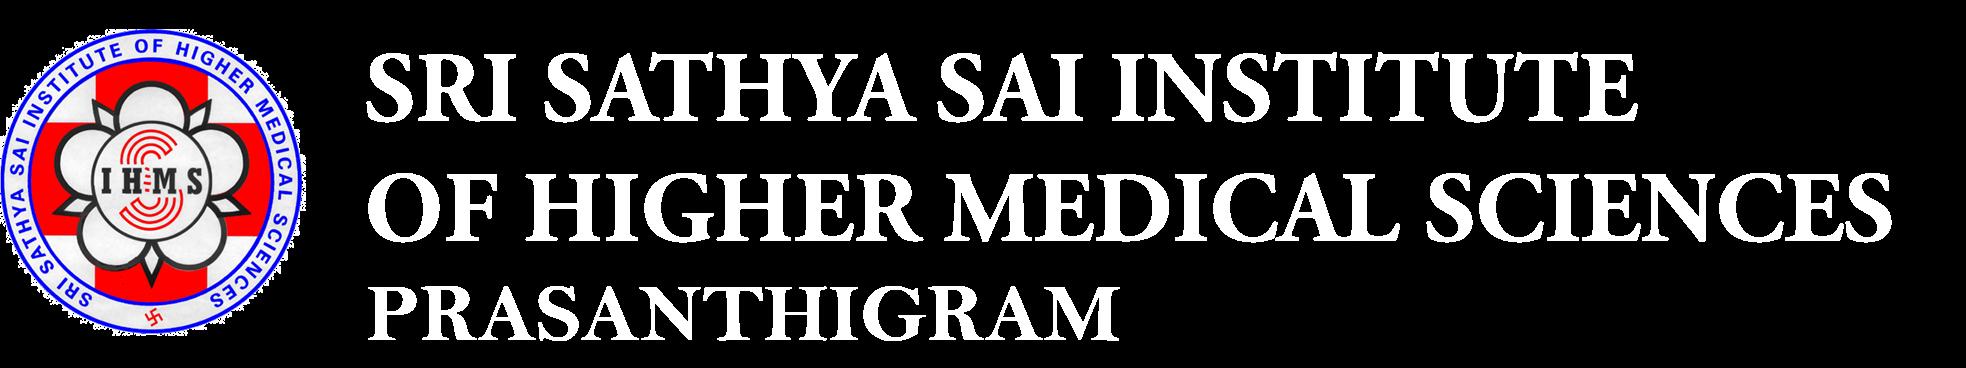 Sri Sathya Sai Institute of Higher Medical Sciences, Prasanthigram